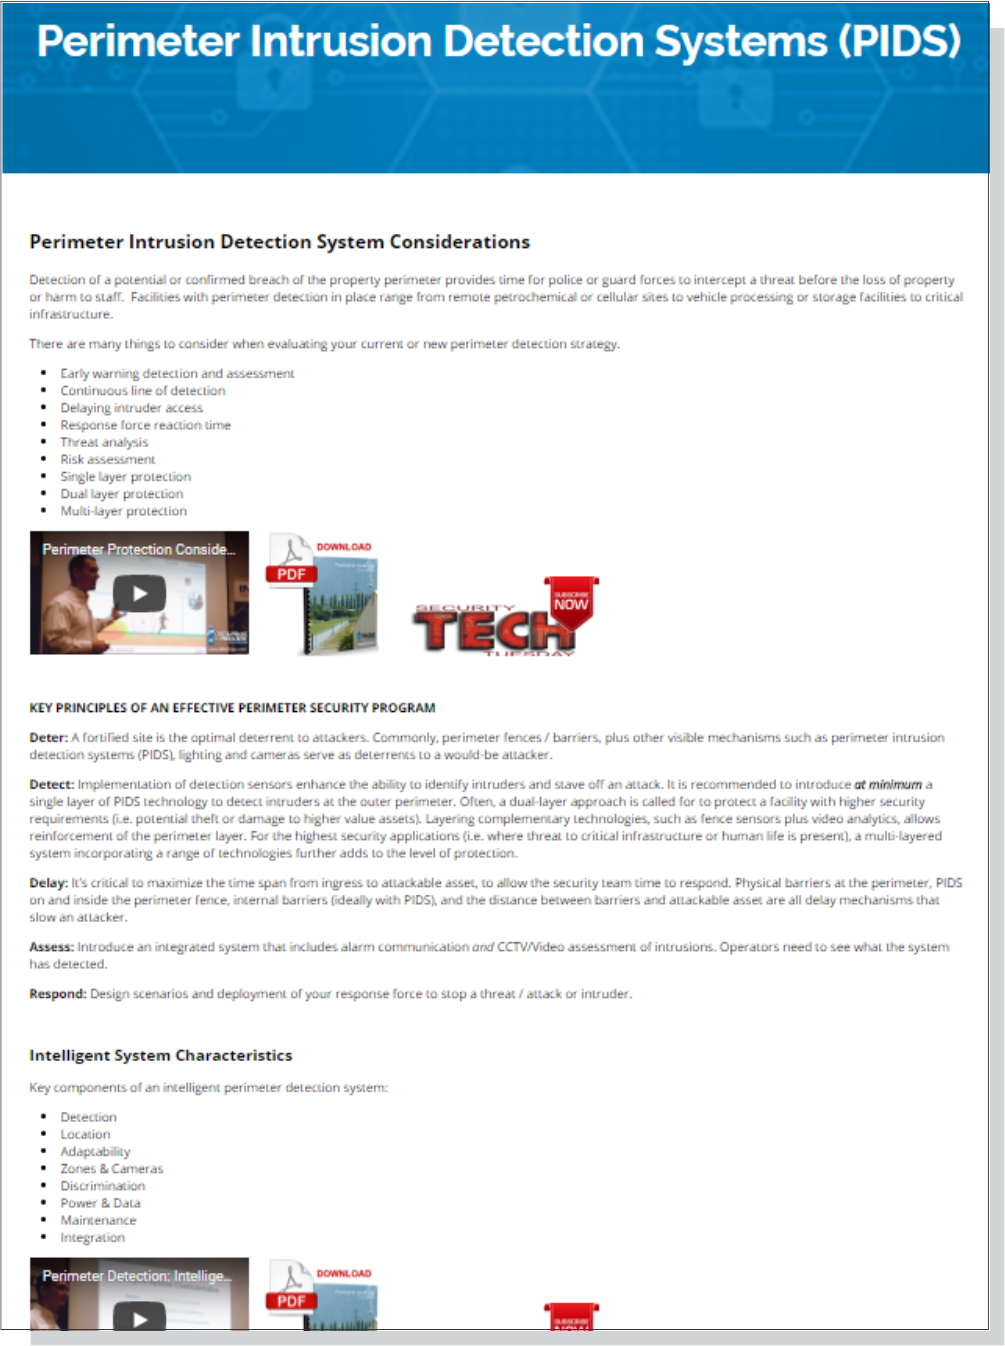 Southwest Microwave Web Portal Image.png